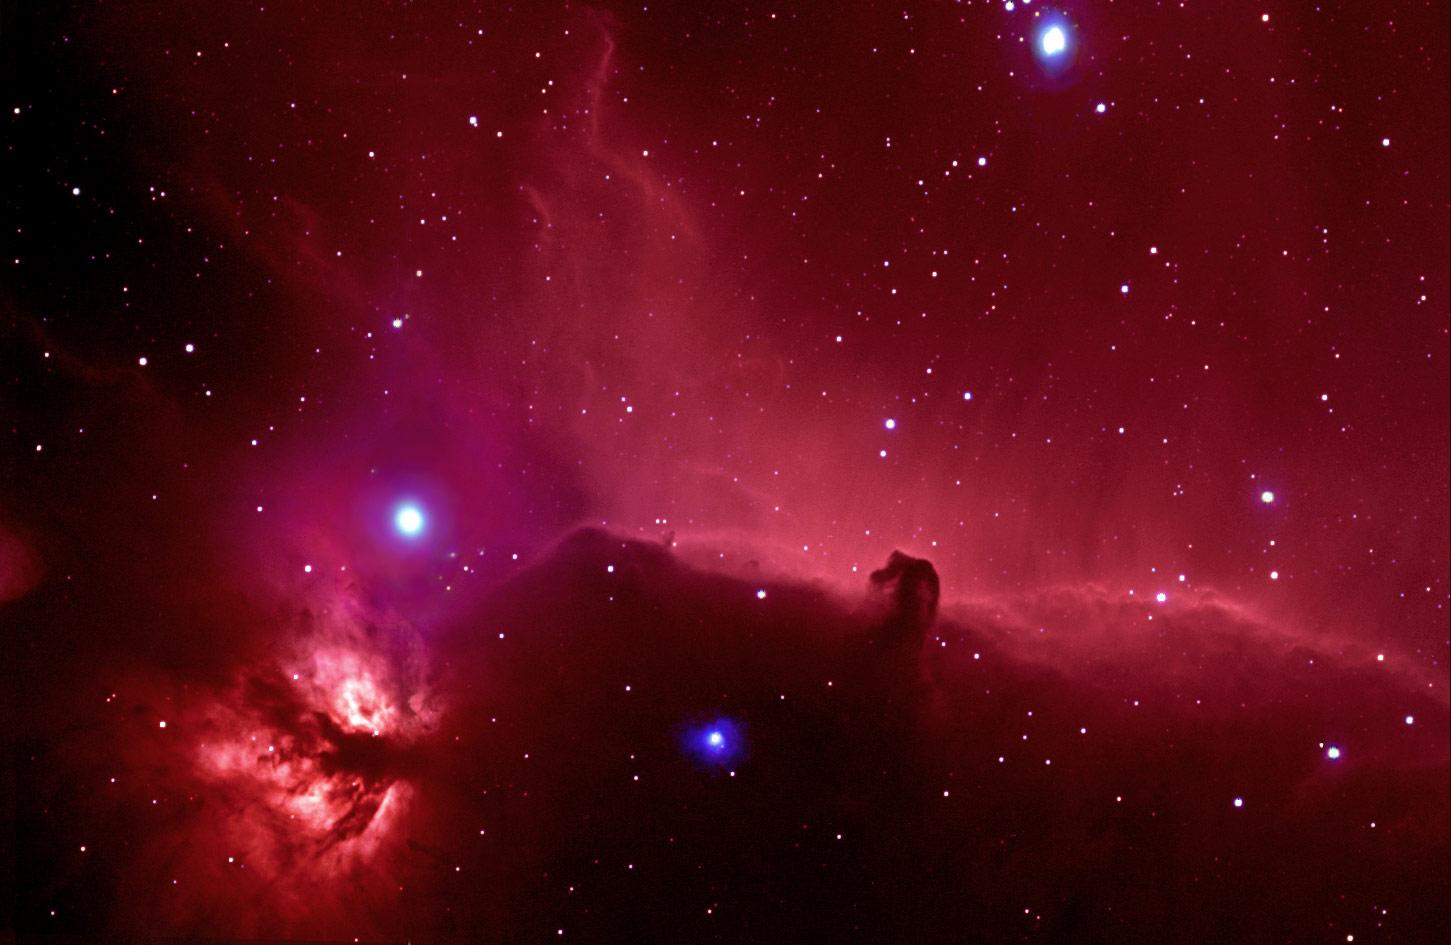 Most Inspiring Wallpaper Horse Nebula - horsehead_nebula  2018_501382.jpg